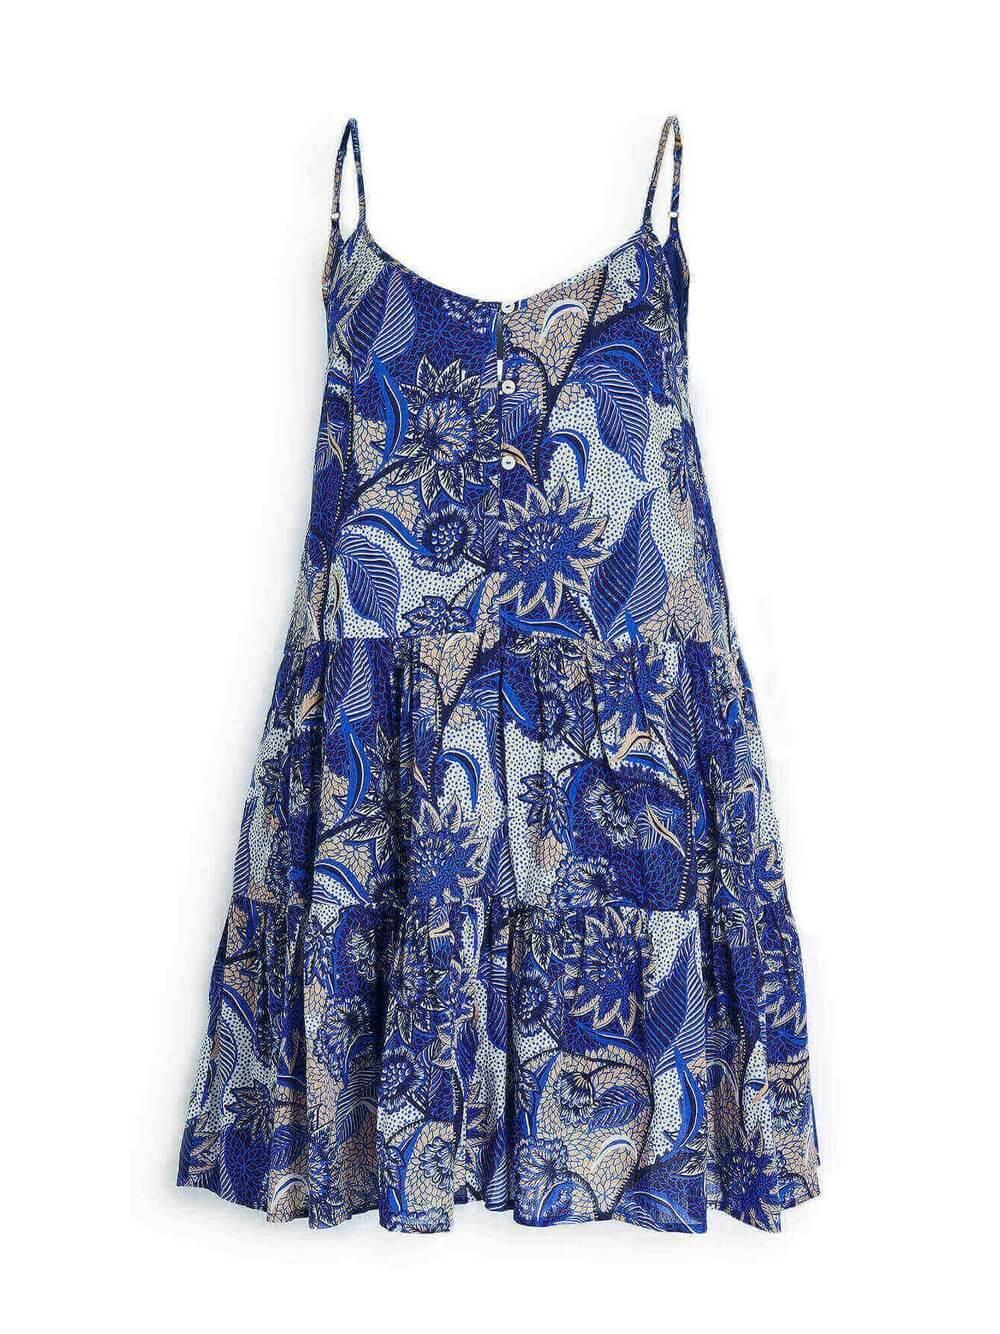 Zahara Short Tiered Printed Dress Item # ZAHARA04